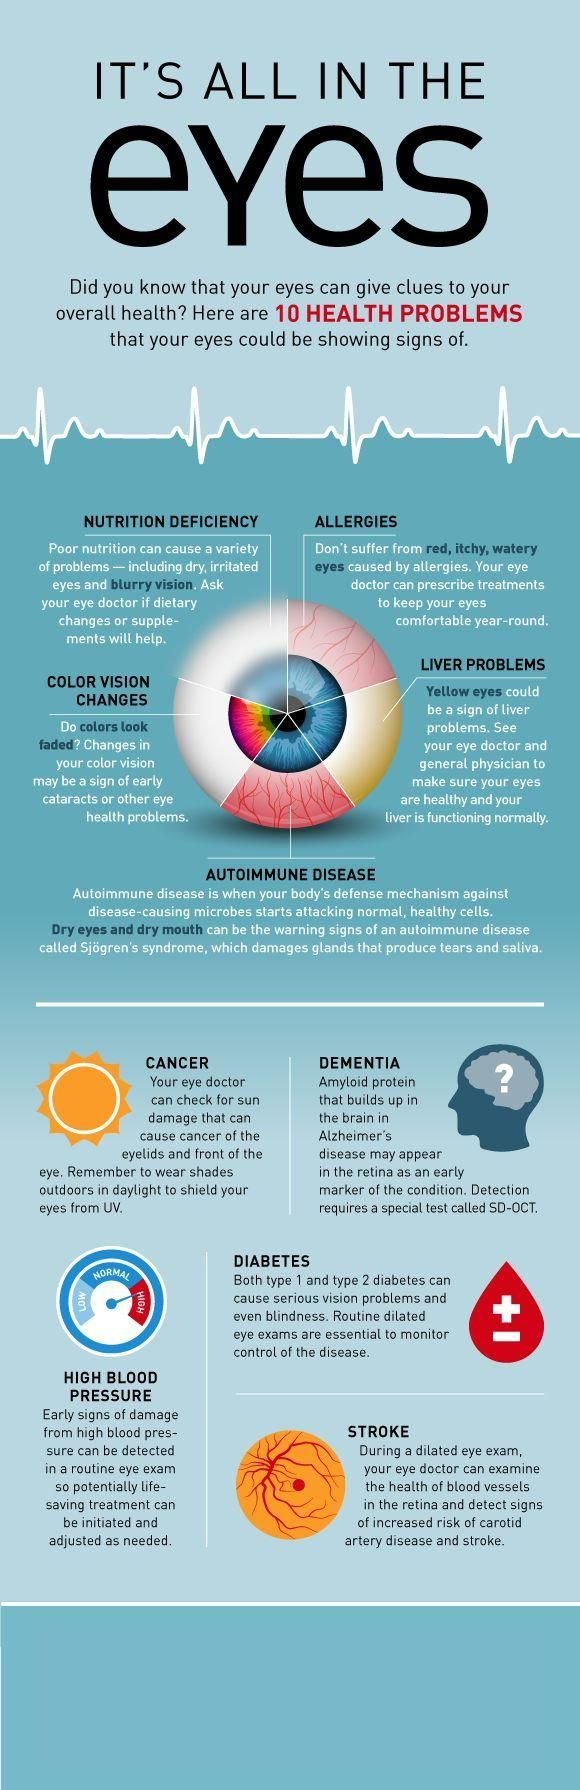 7 Health Warnings Your Eyes May Be Sending